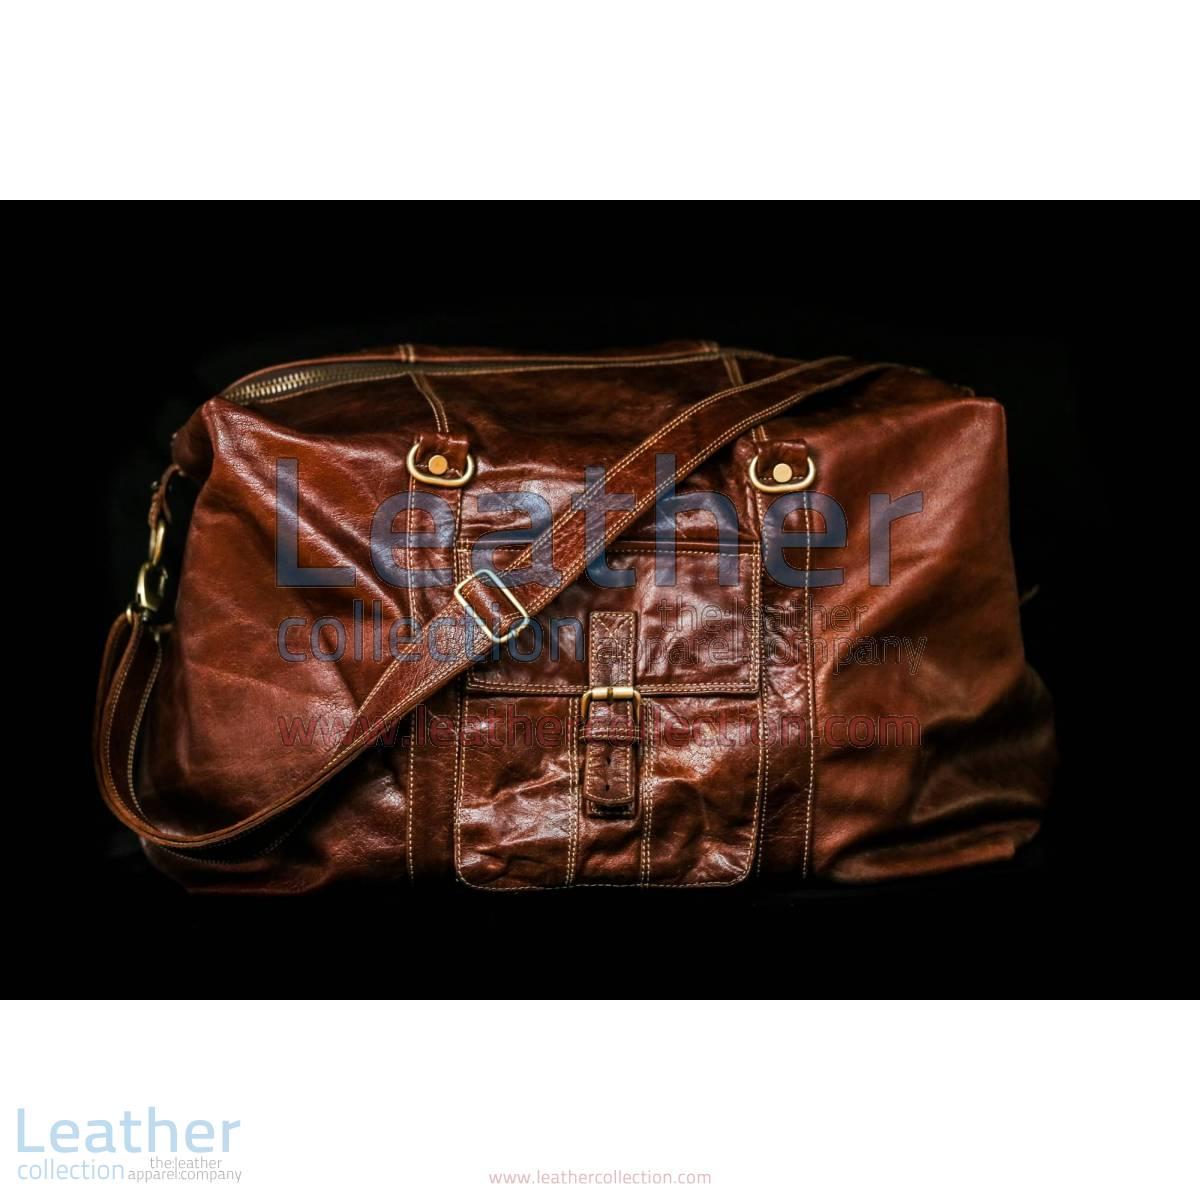 Rome Leather Luggage Bag | luggage bag,leather luggage bag